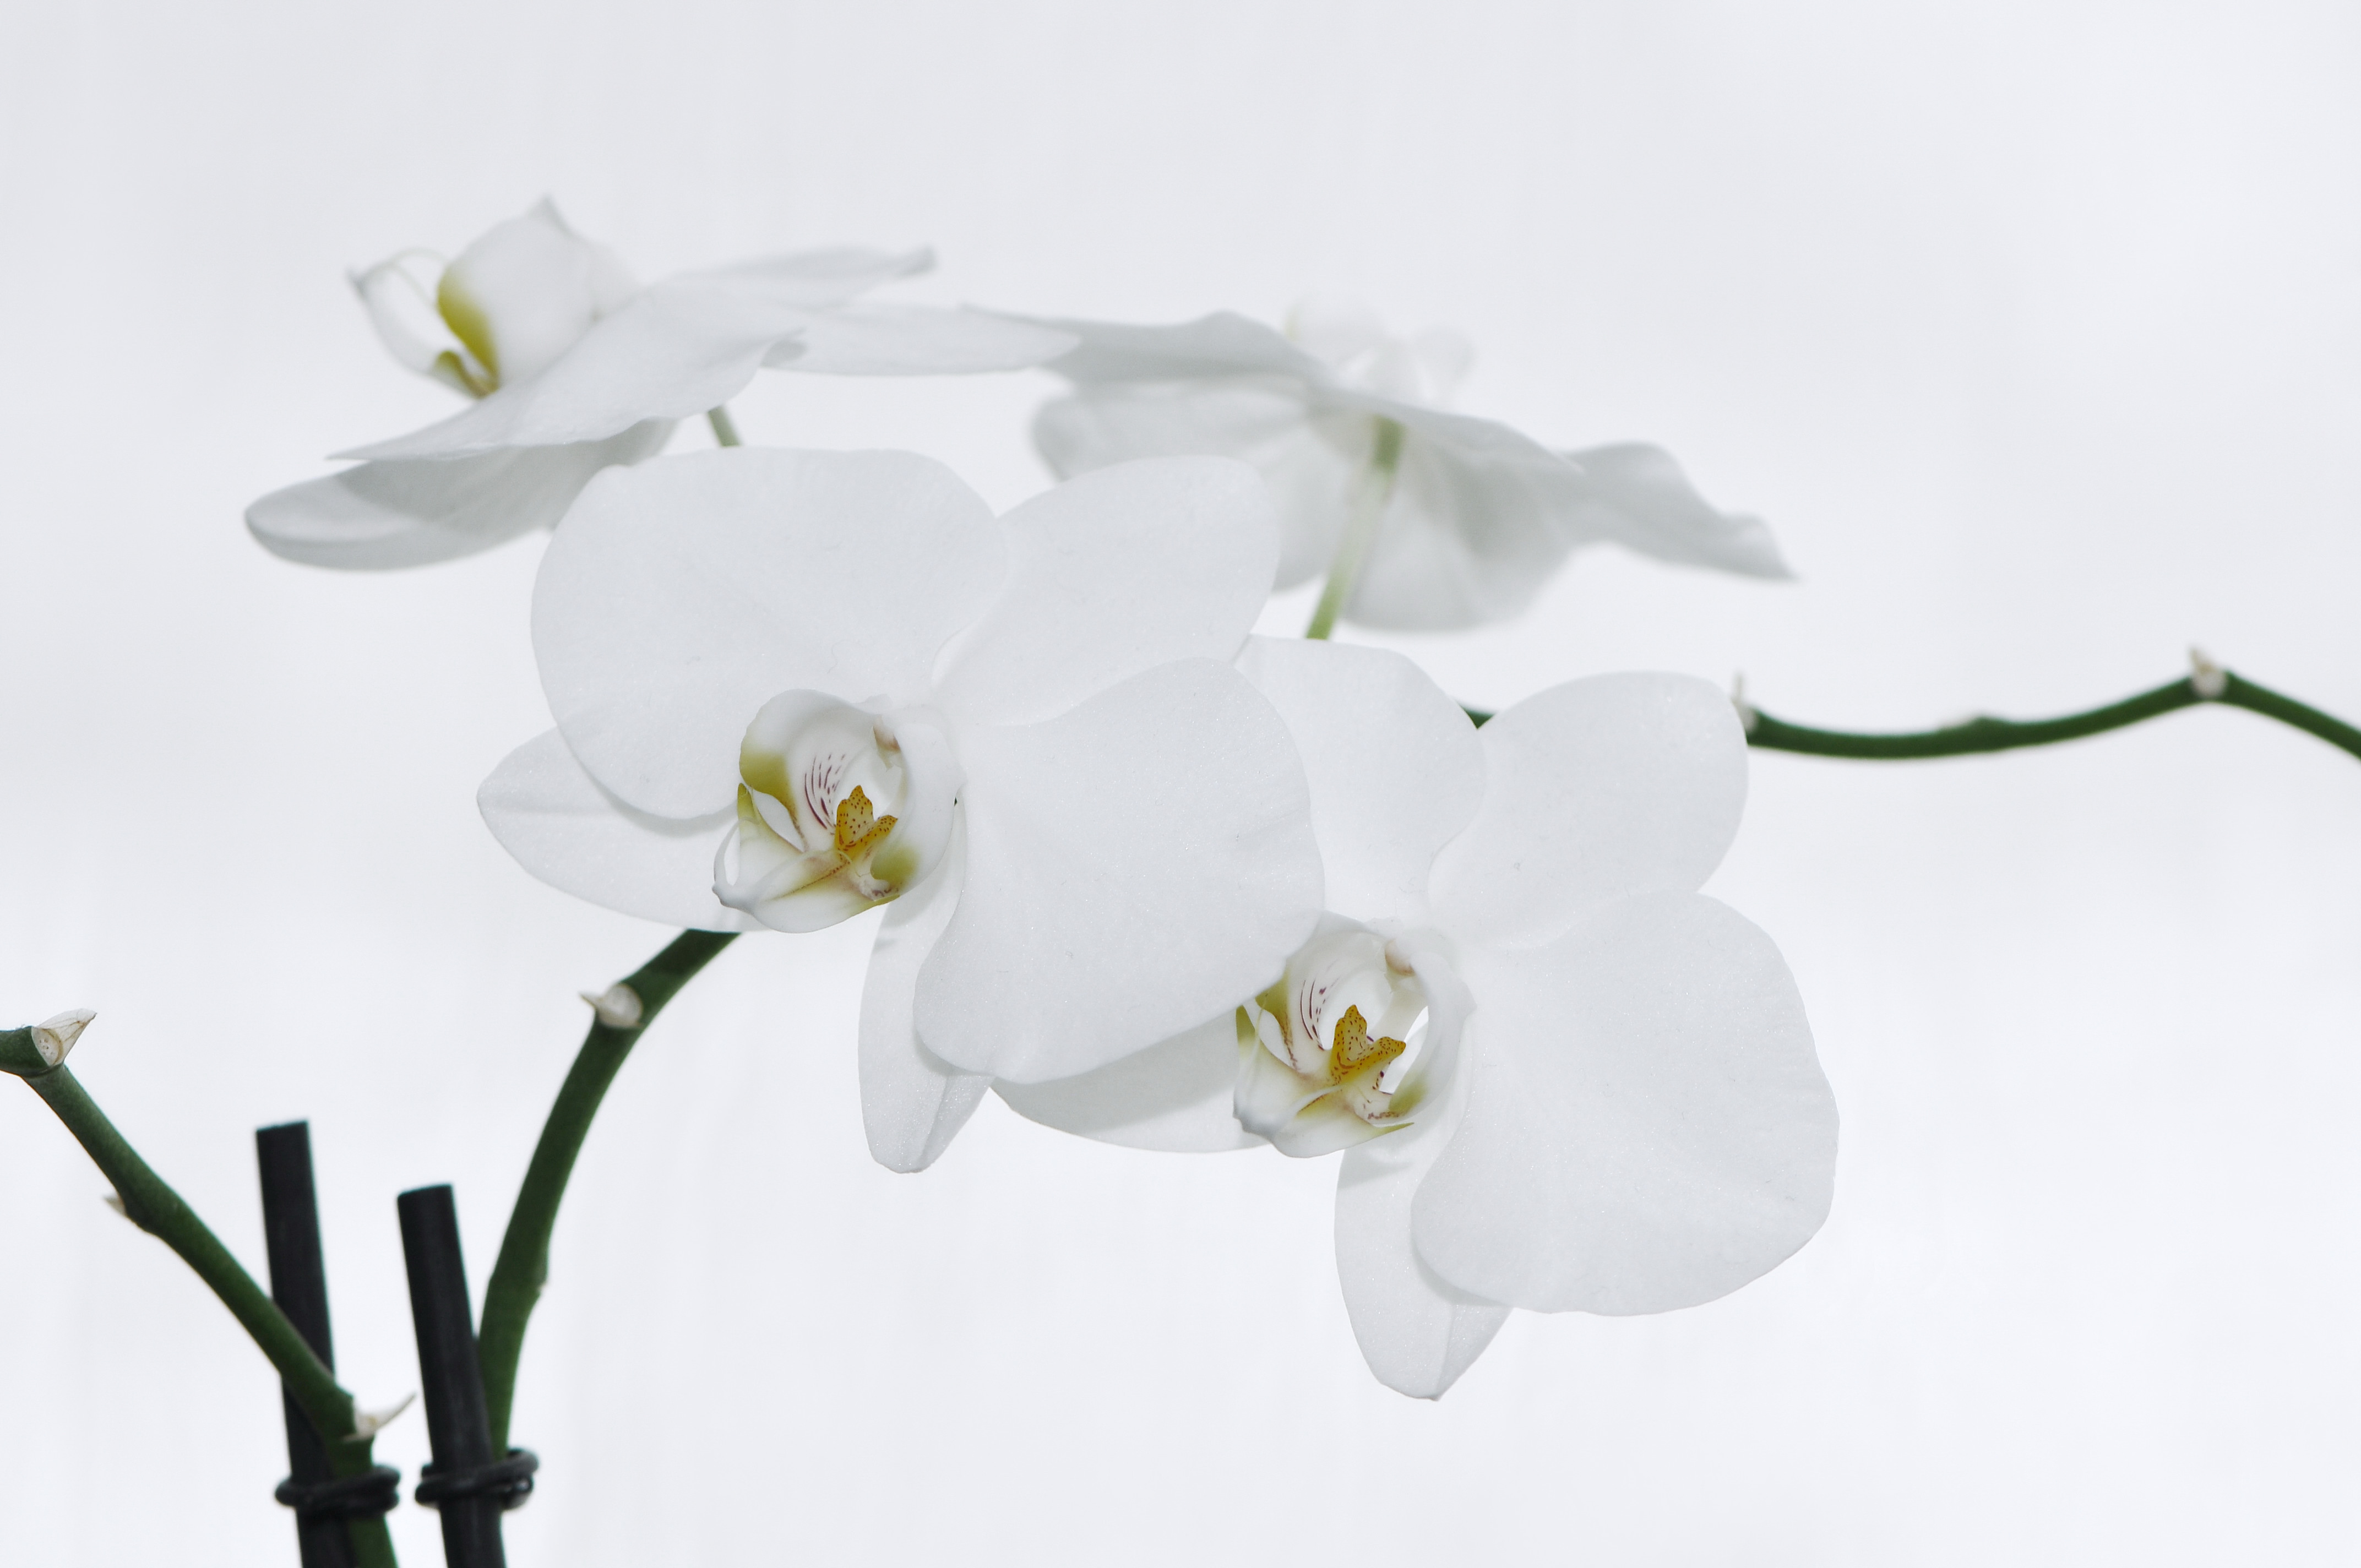 File:Nachtfalter Orchidee, Phalaenopsis 11.JPG - Wikimedia Commons